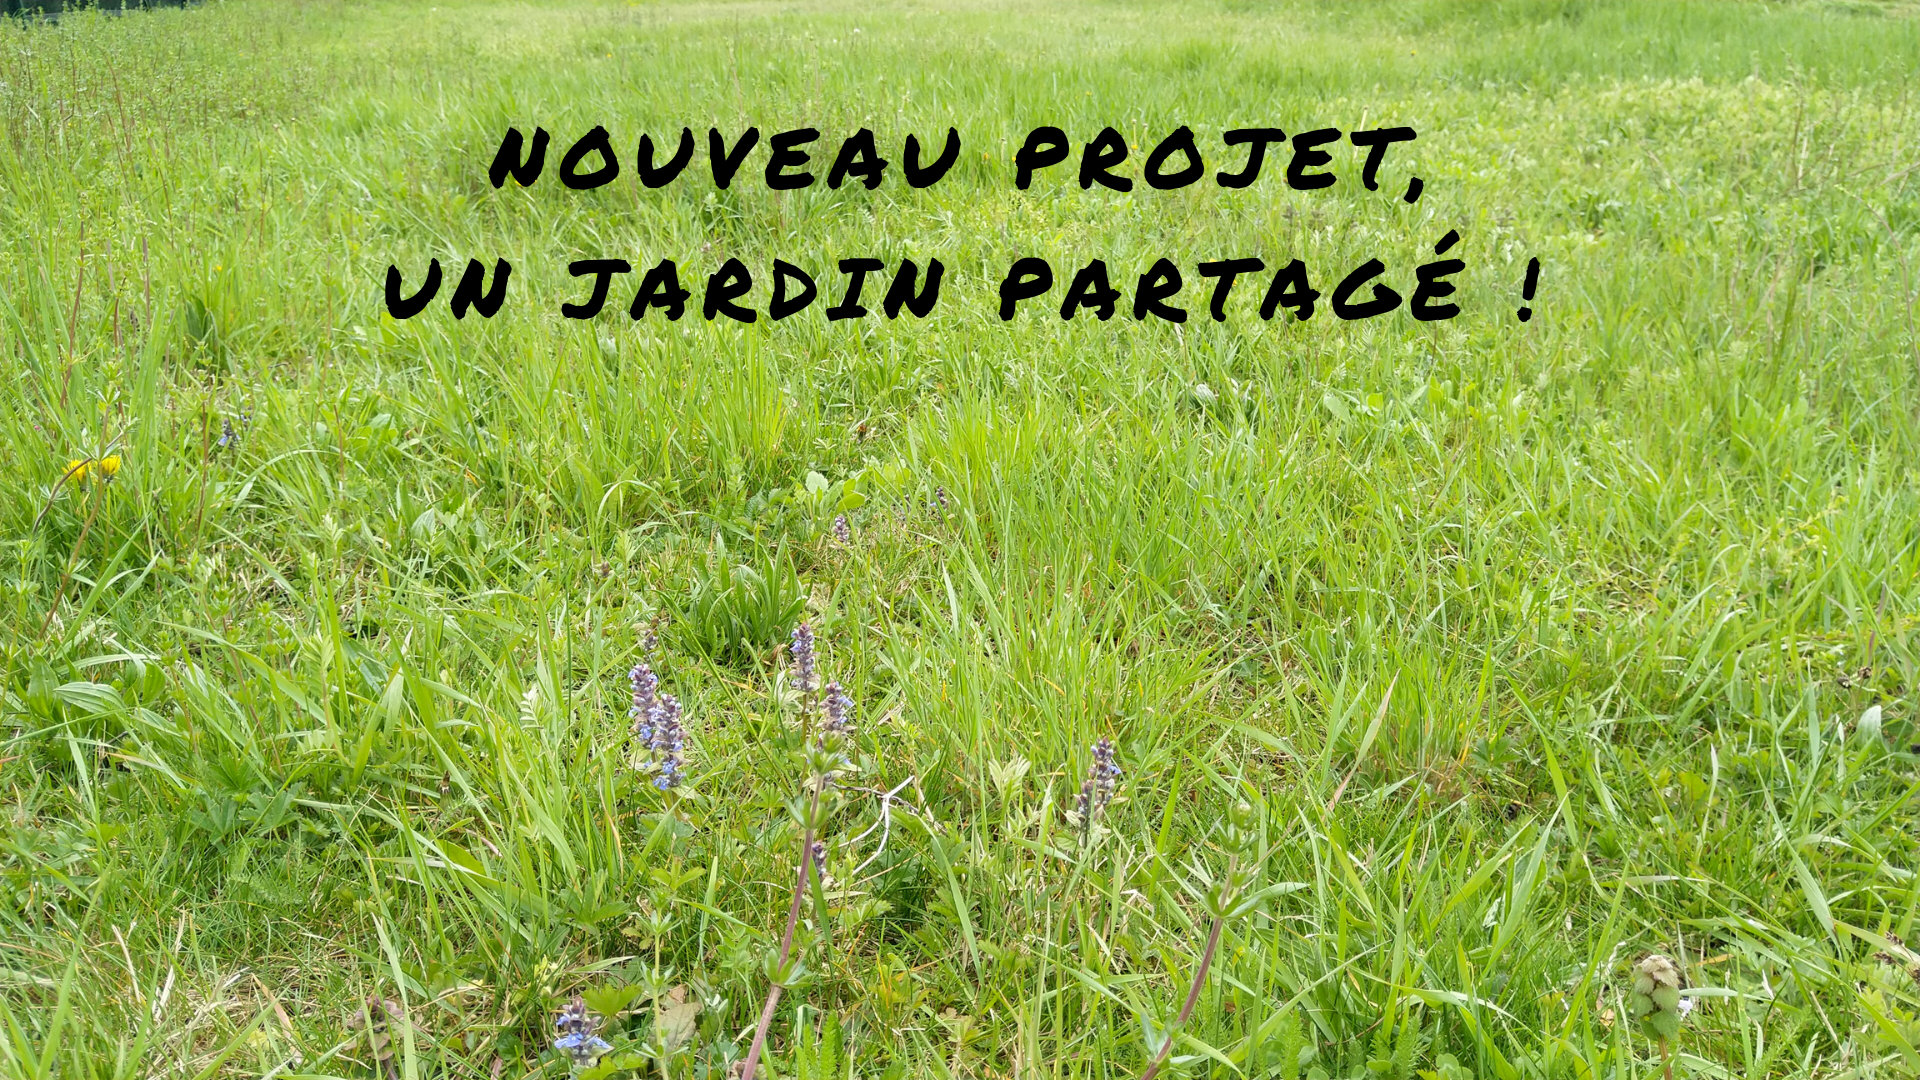 jardin-partagé-agriculture-permaculture-urbaine-projet